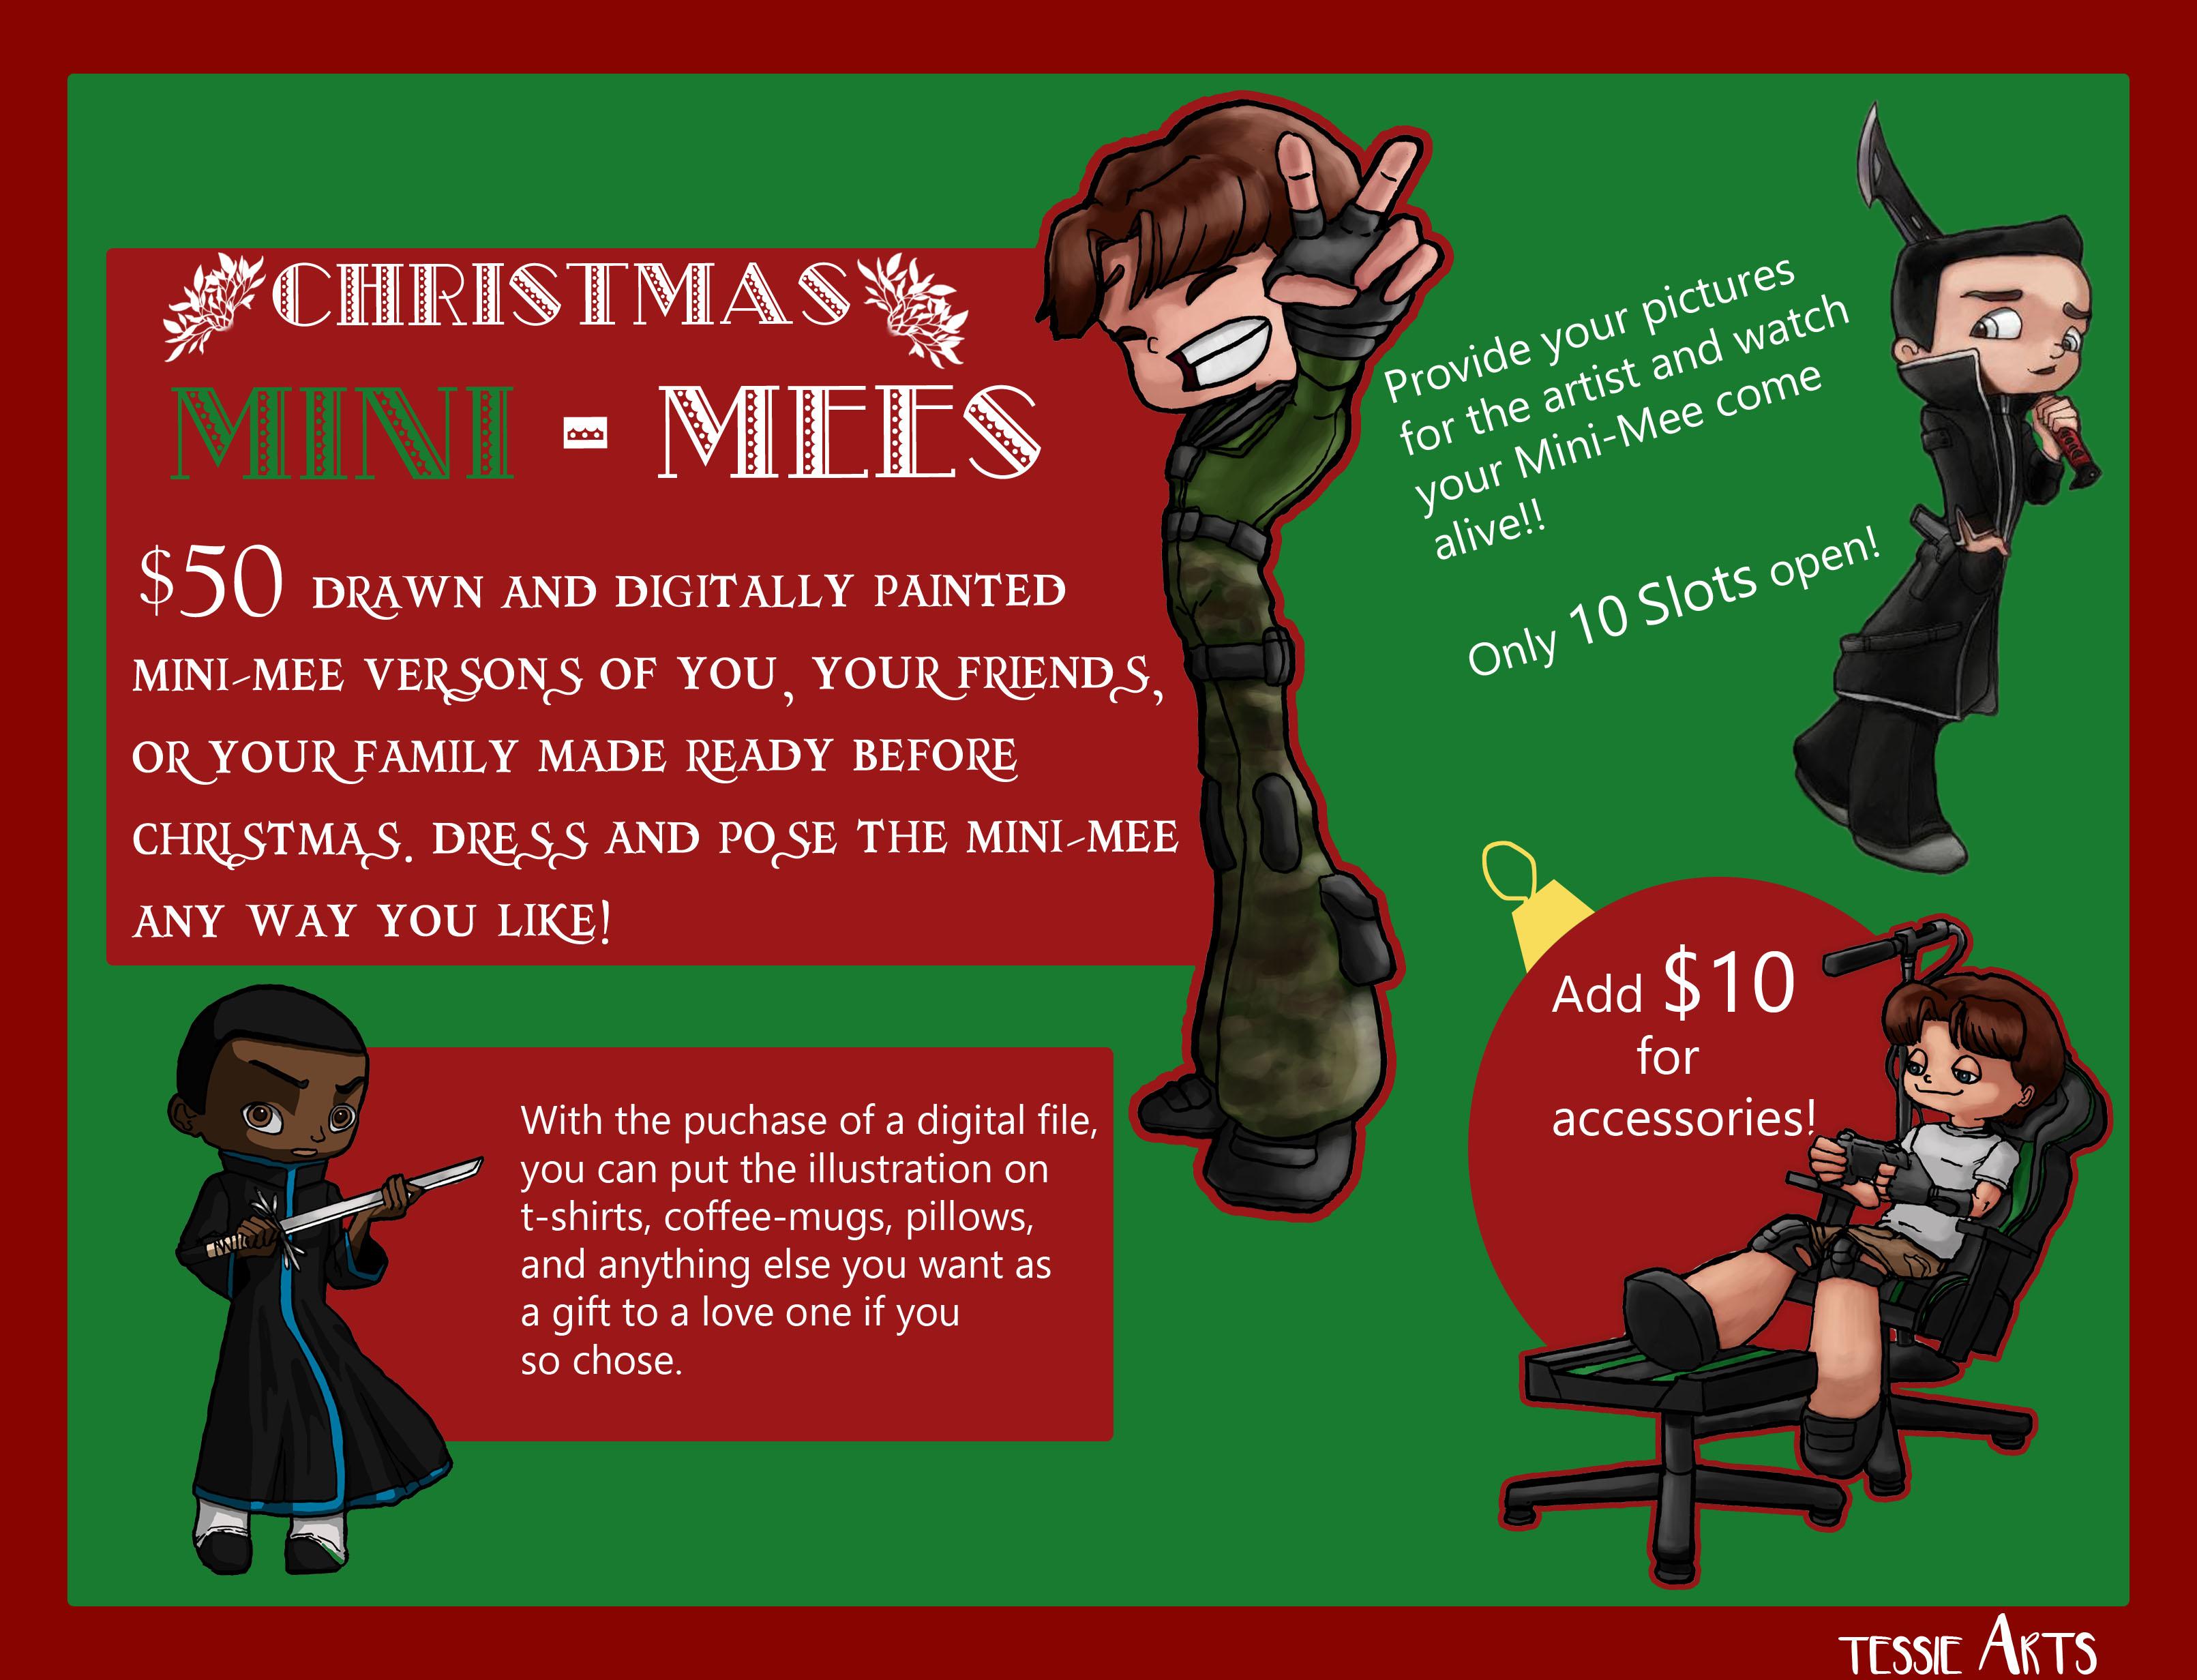 Christmas_mini_mees.jpg